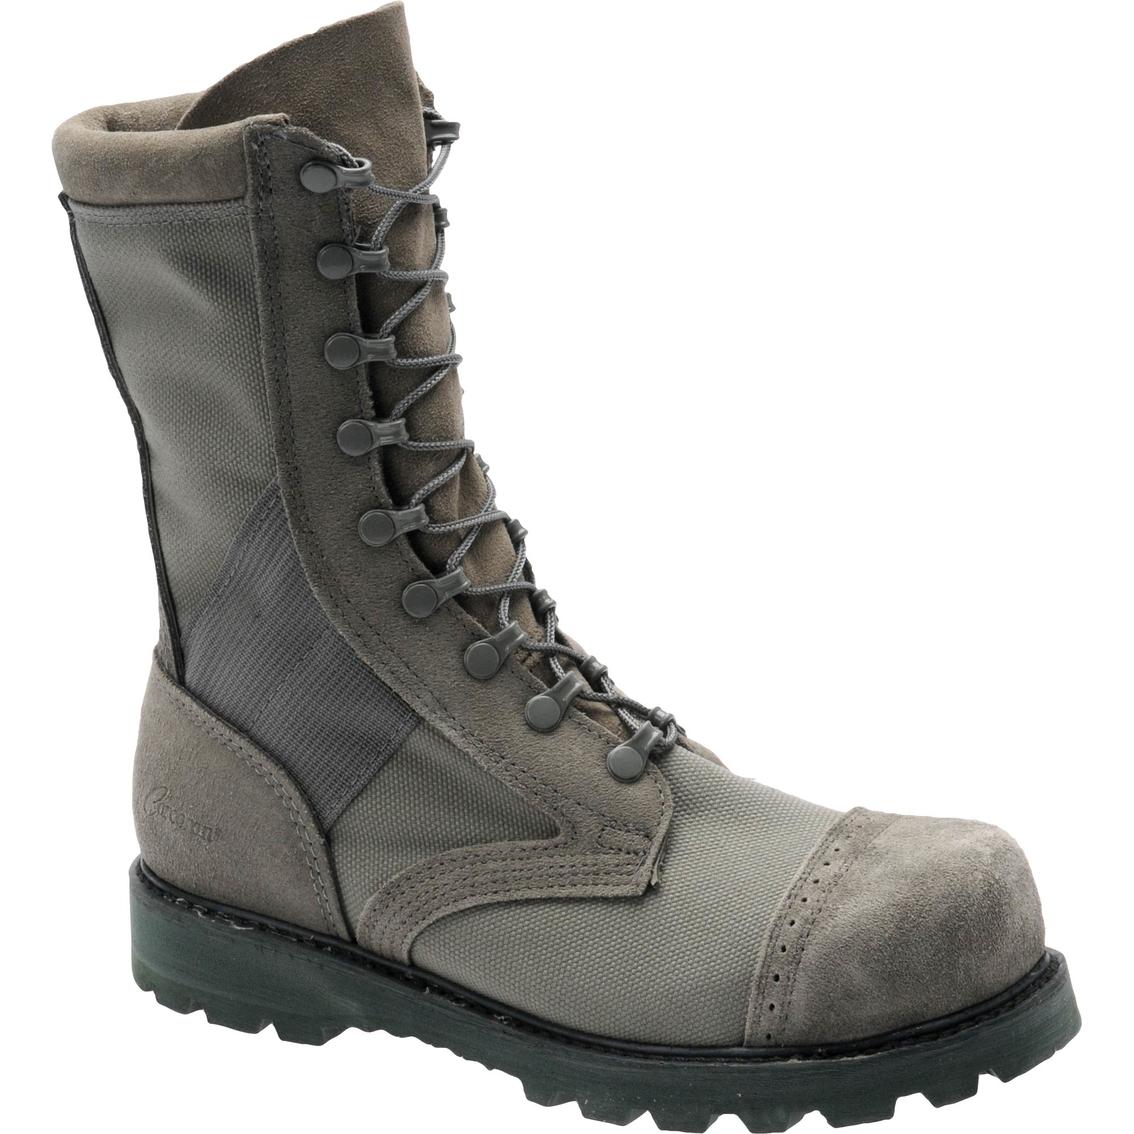 Corcoran Men S Sage Green Marauder Steel Toe Boot Air